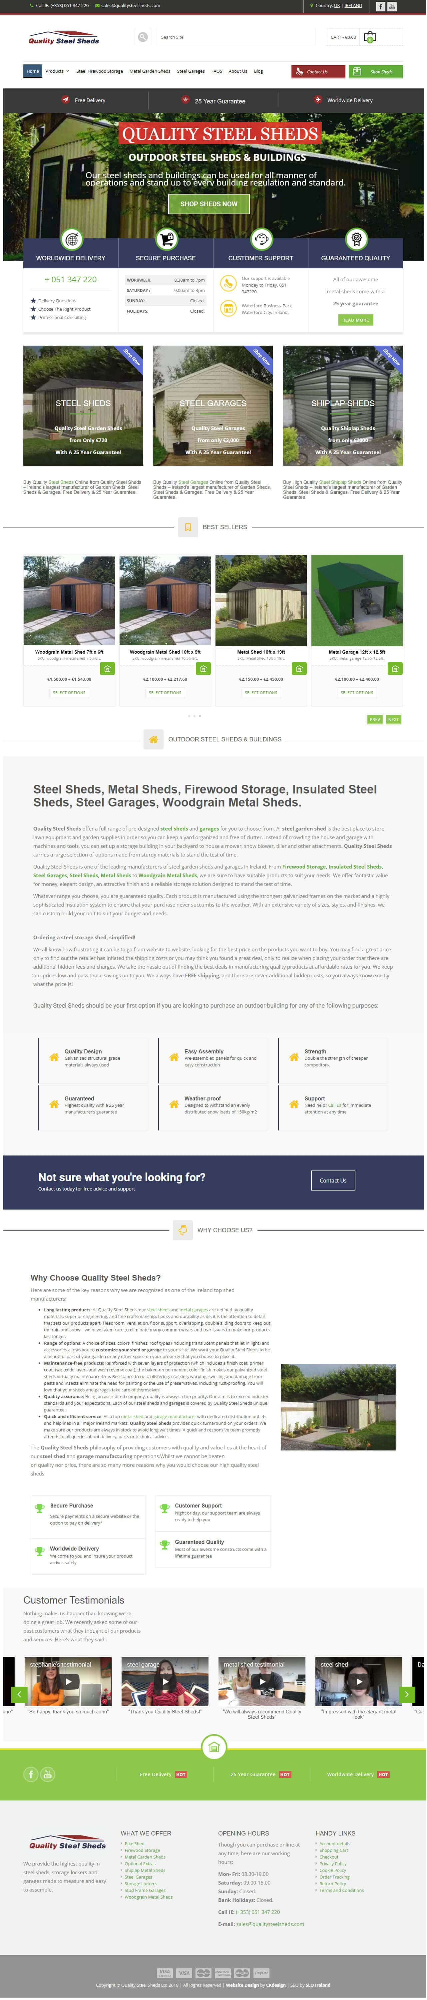 quality steel sheds website screenshot